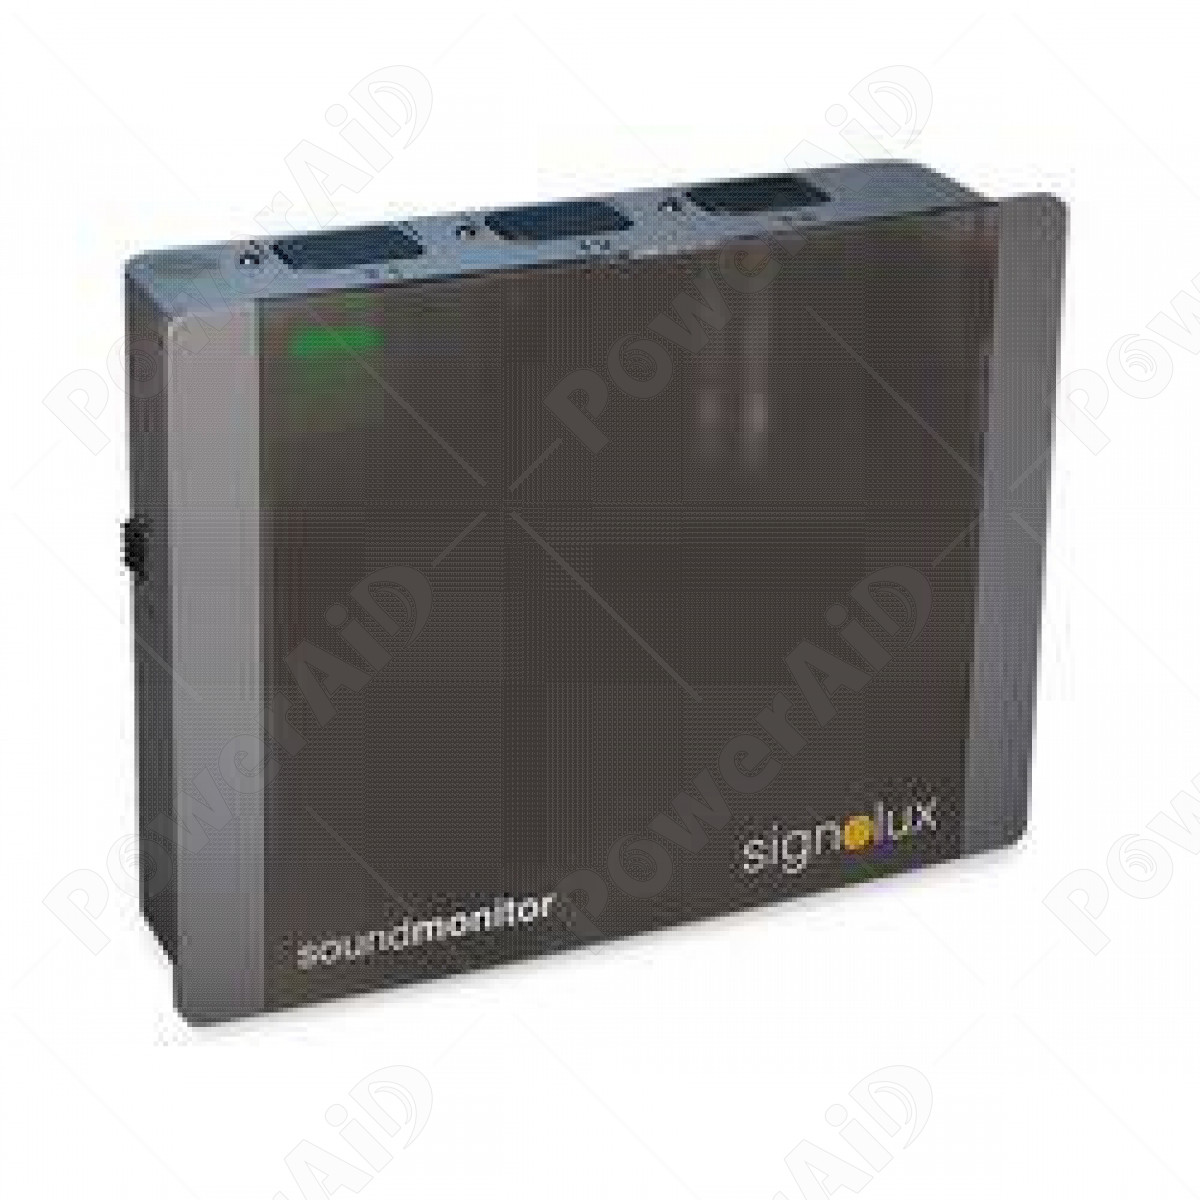 Humantechnik - Sound Monitor Signolux